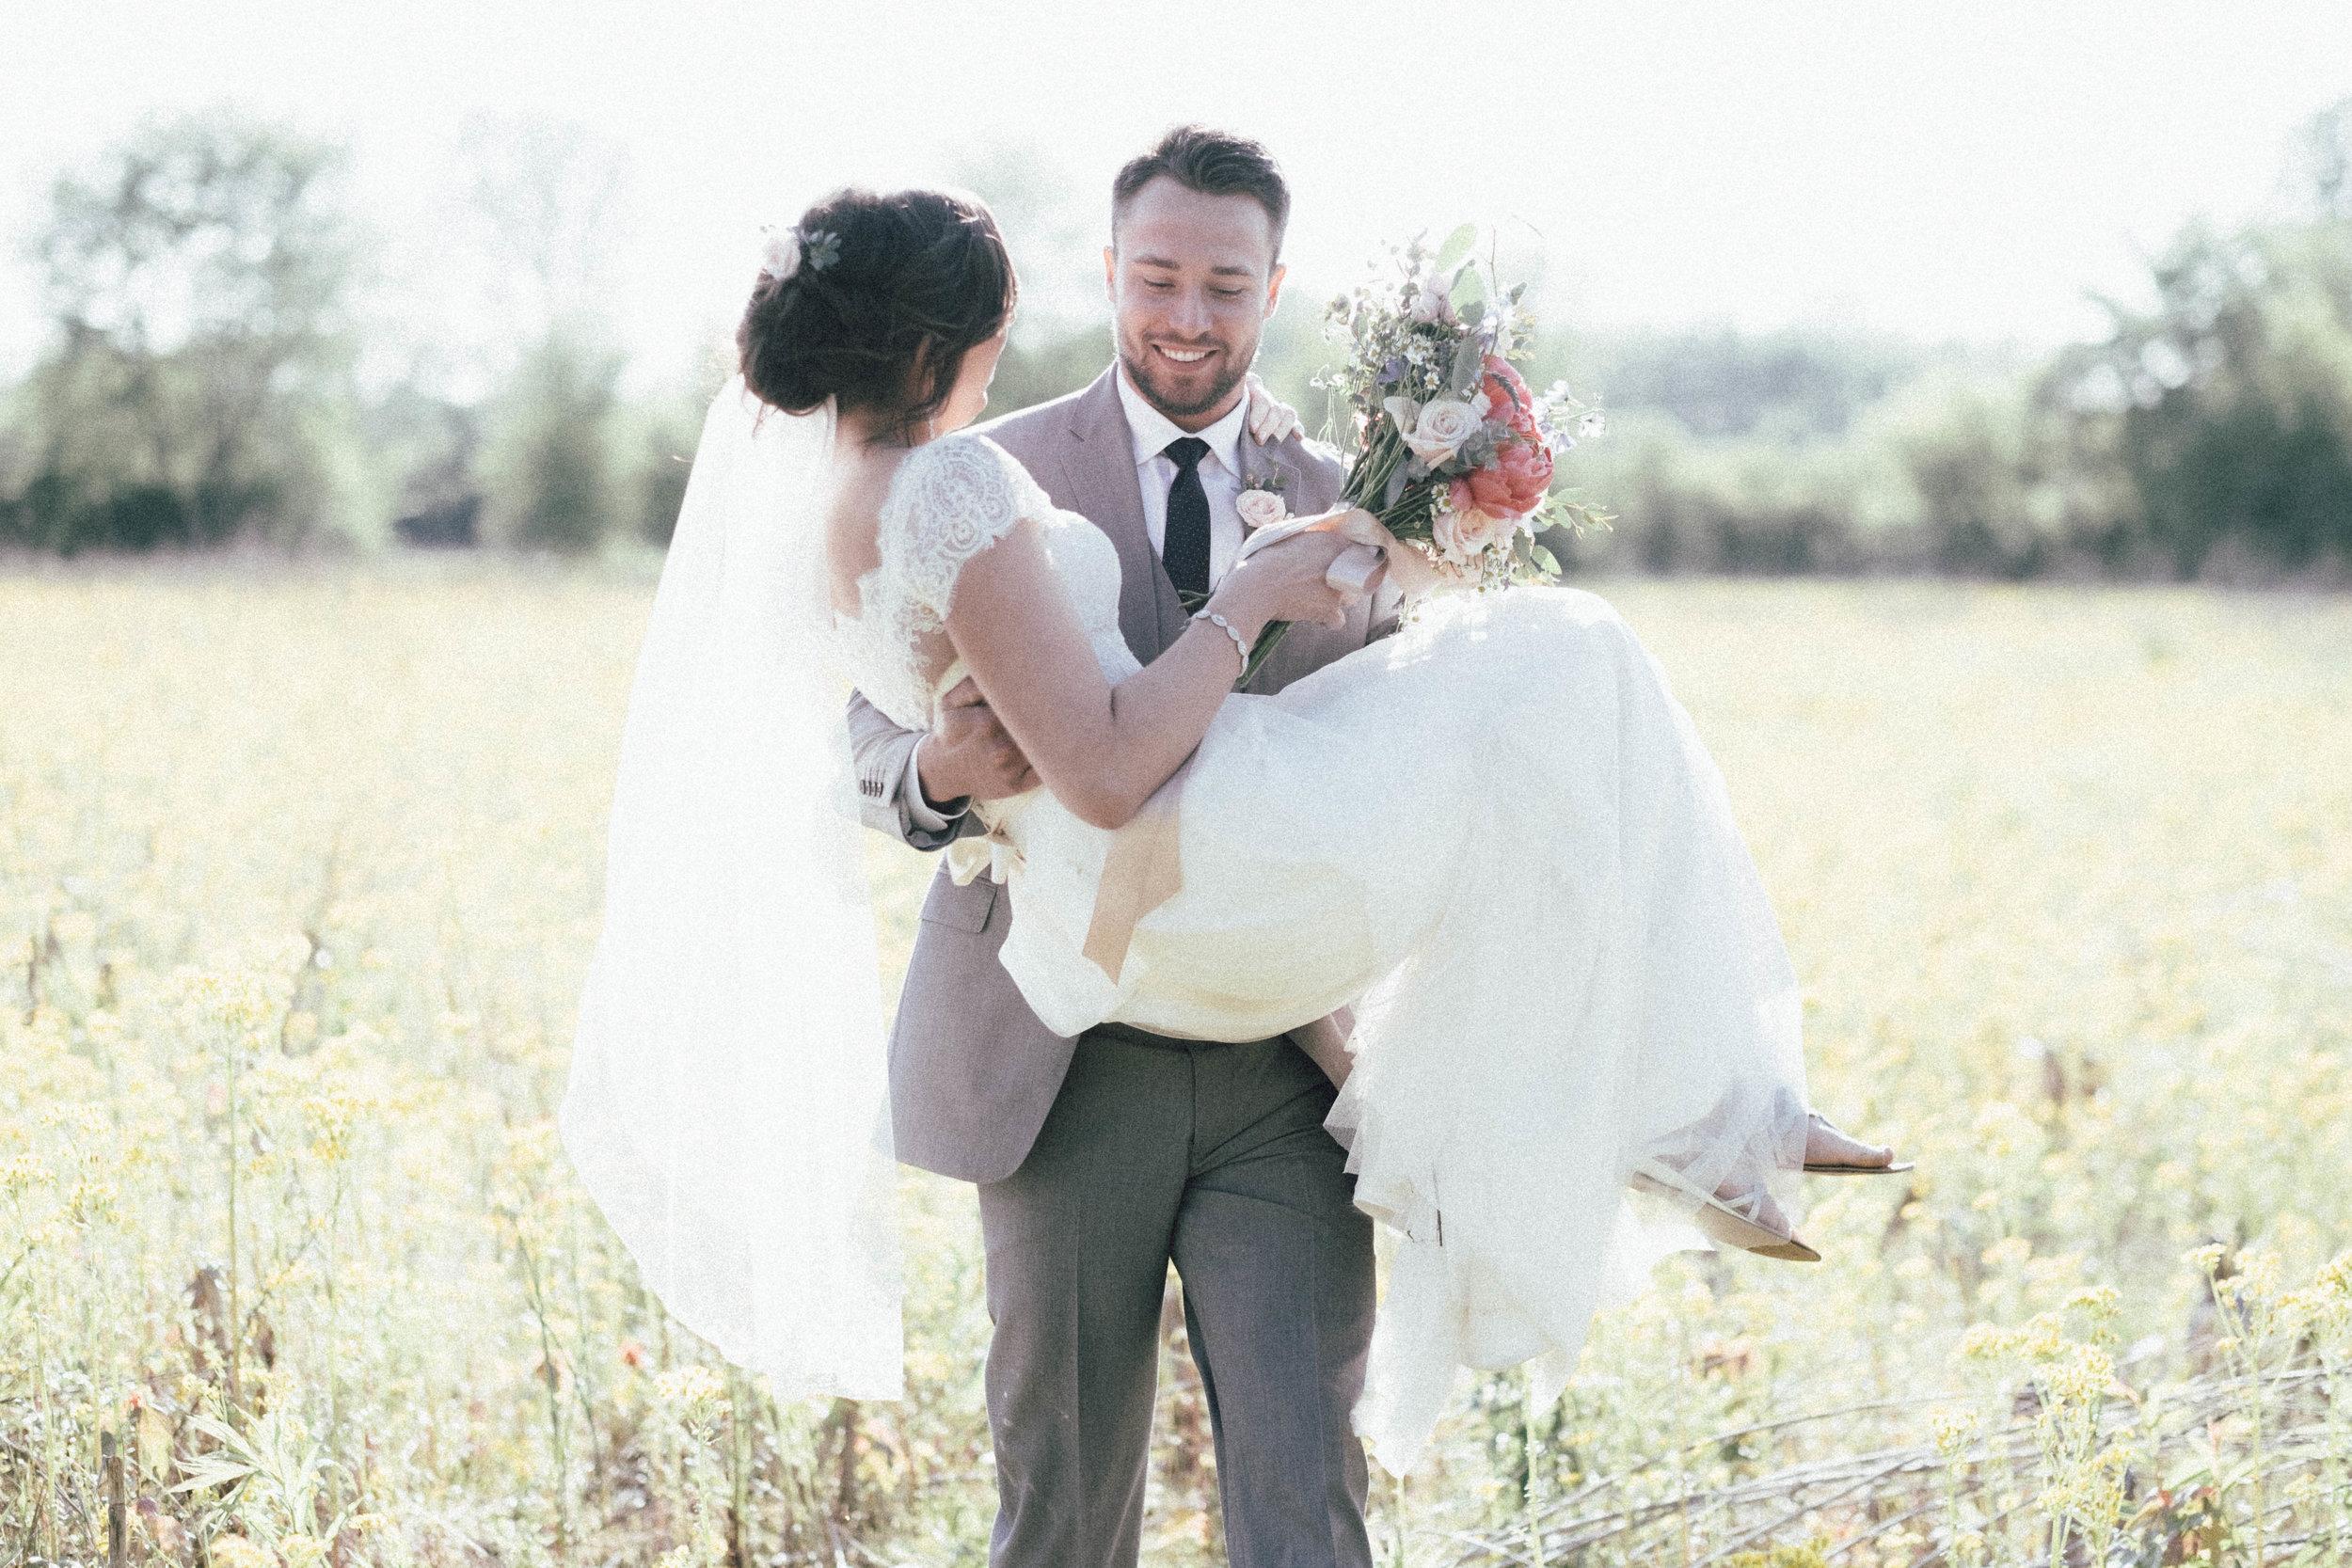 Steph-Ben-Blog-Indianapolis-Wedding-52.jpg